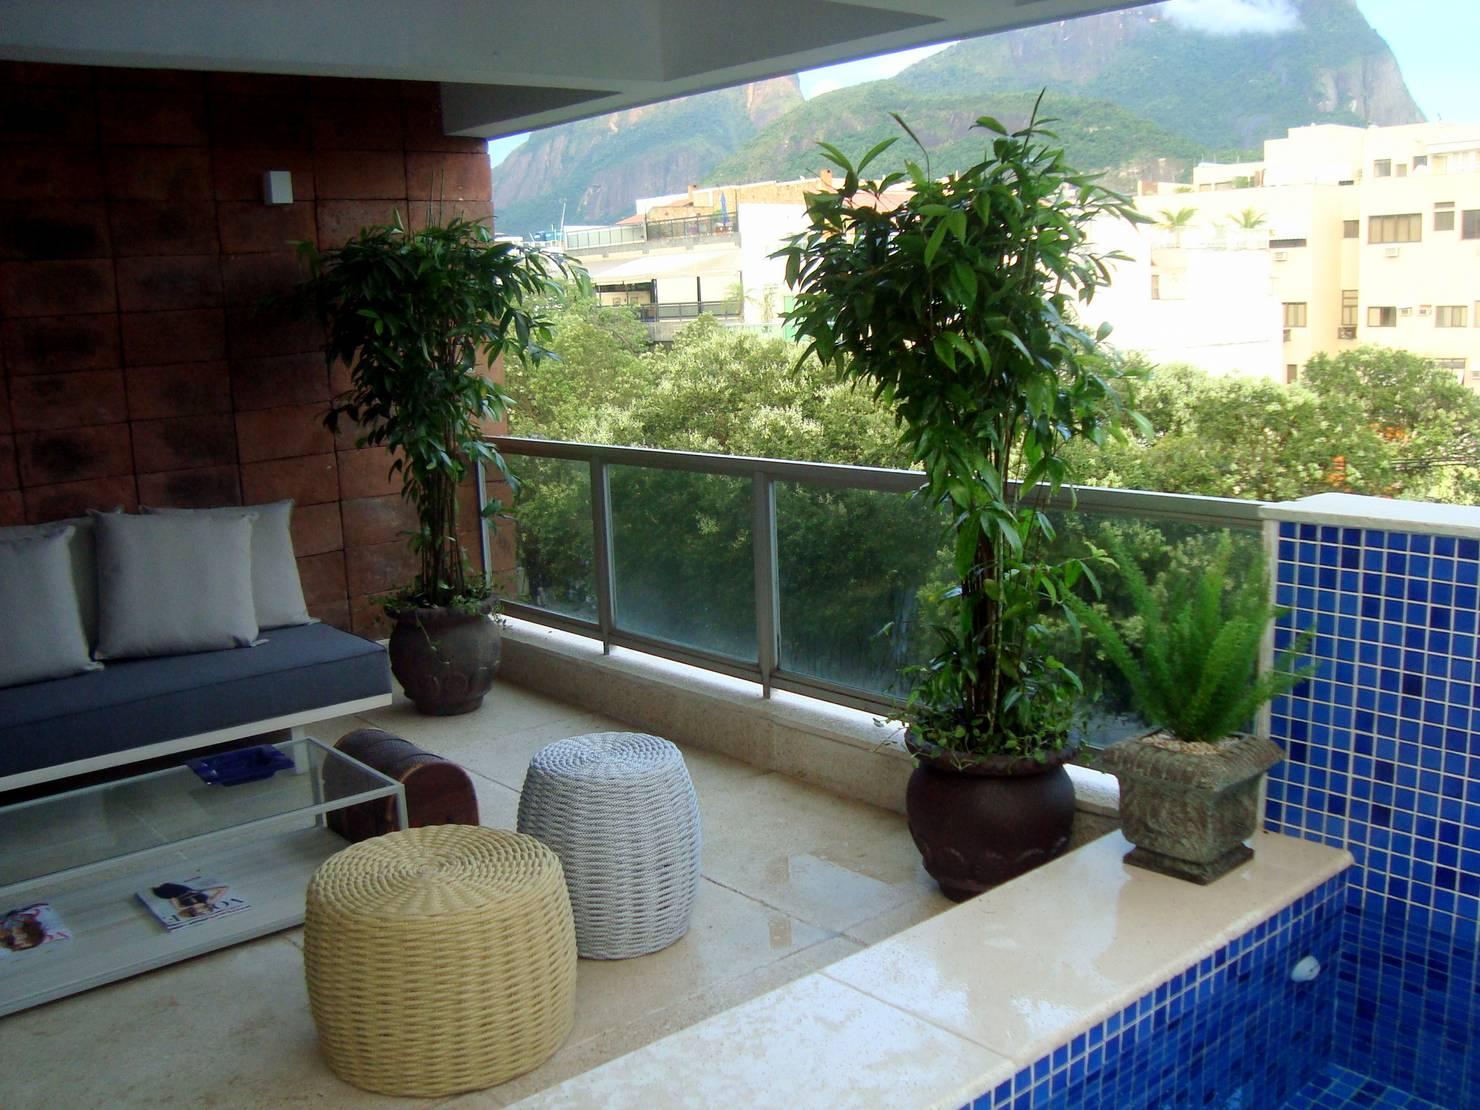 21 ideas inspiradoras para terrazas y balcones ¡maravillosos!